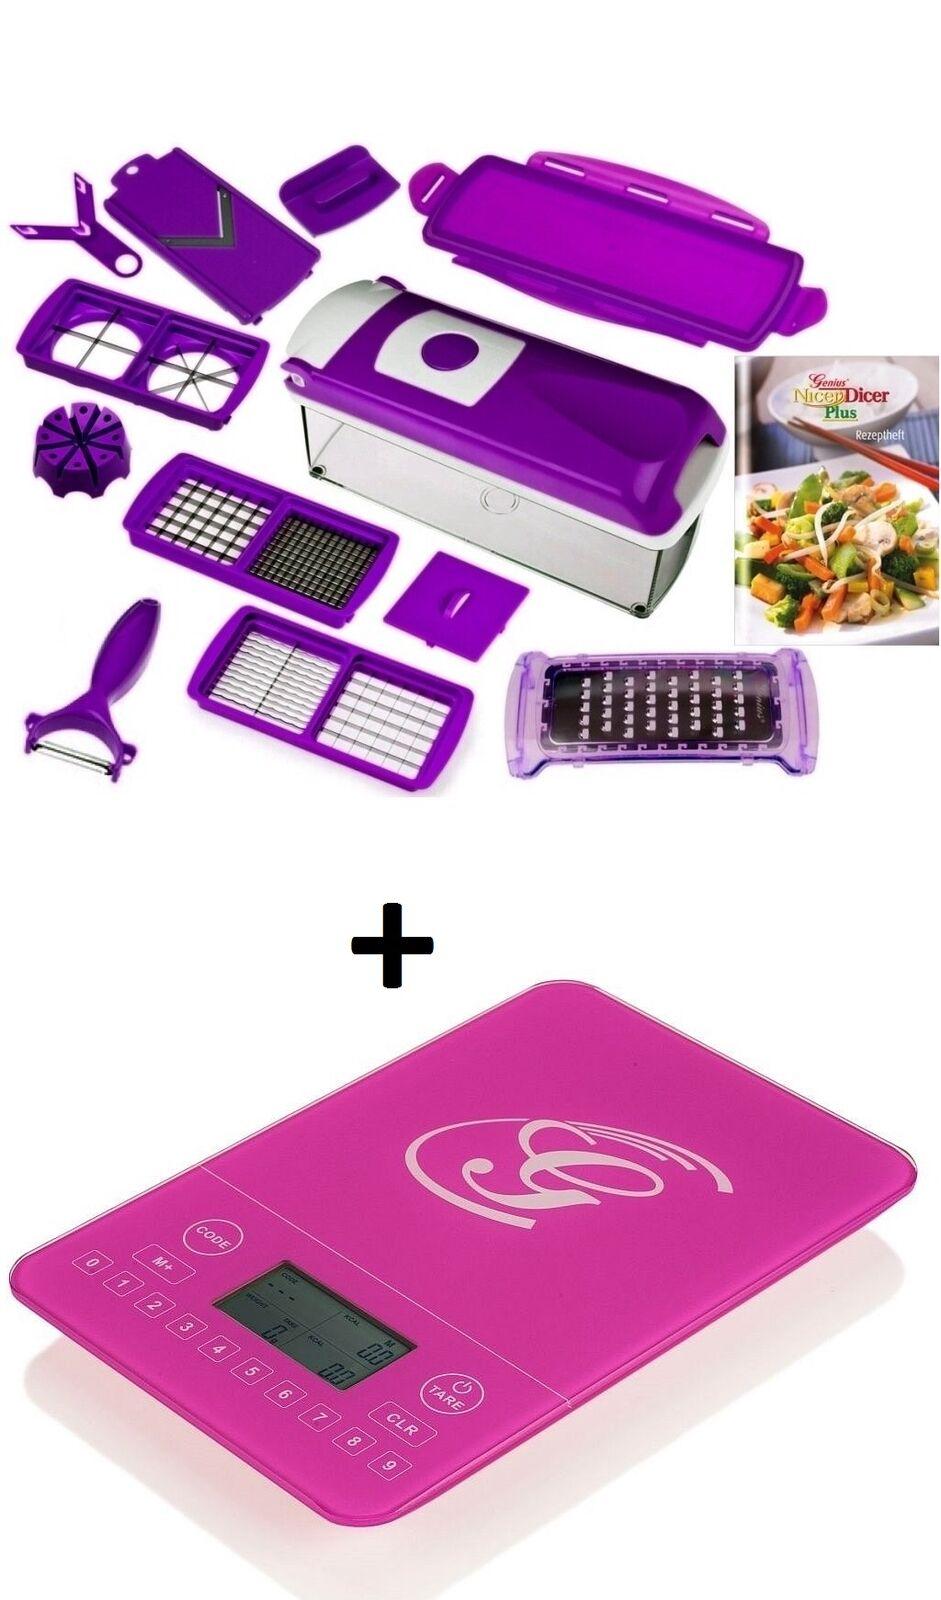 Genius Nicer Dicer plus légumes schneider Multi tailleur 14-tlg violet + balance de cuisine balance